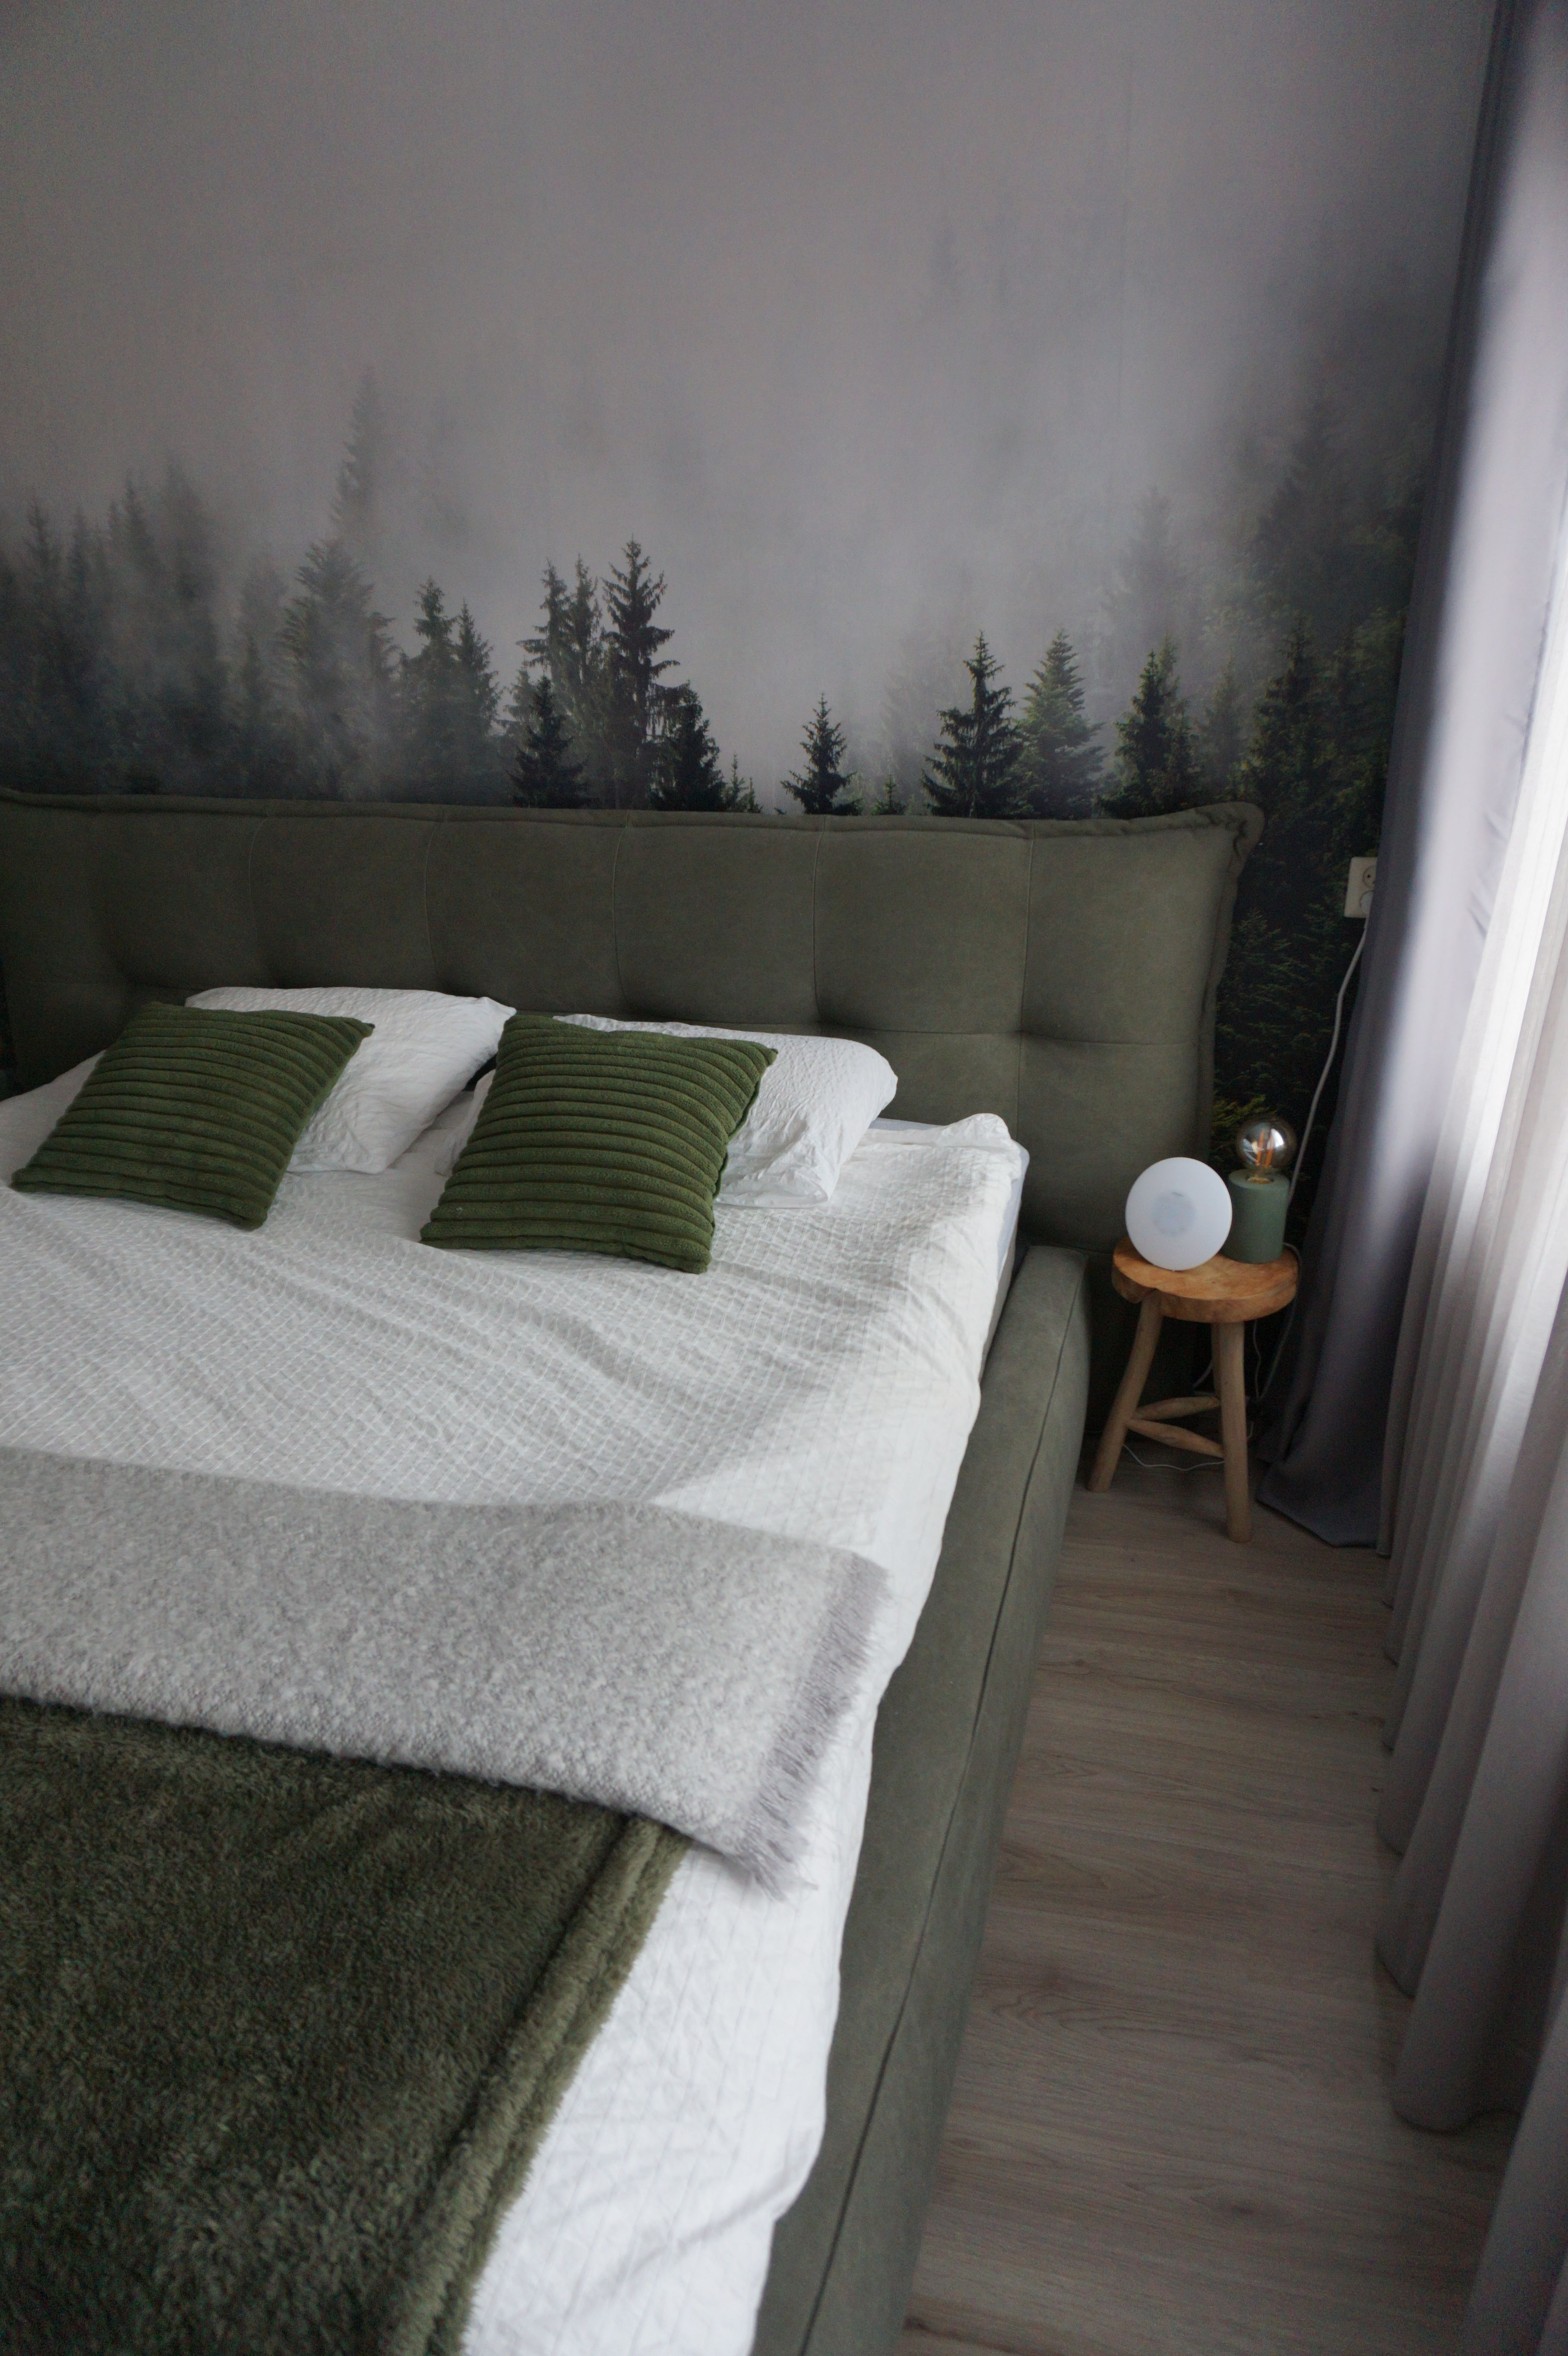 flow design interieuradvies portfolio interieurontwerp slaapkamer groen puur natuur